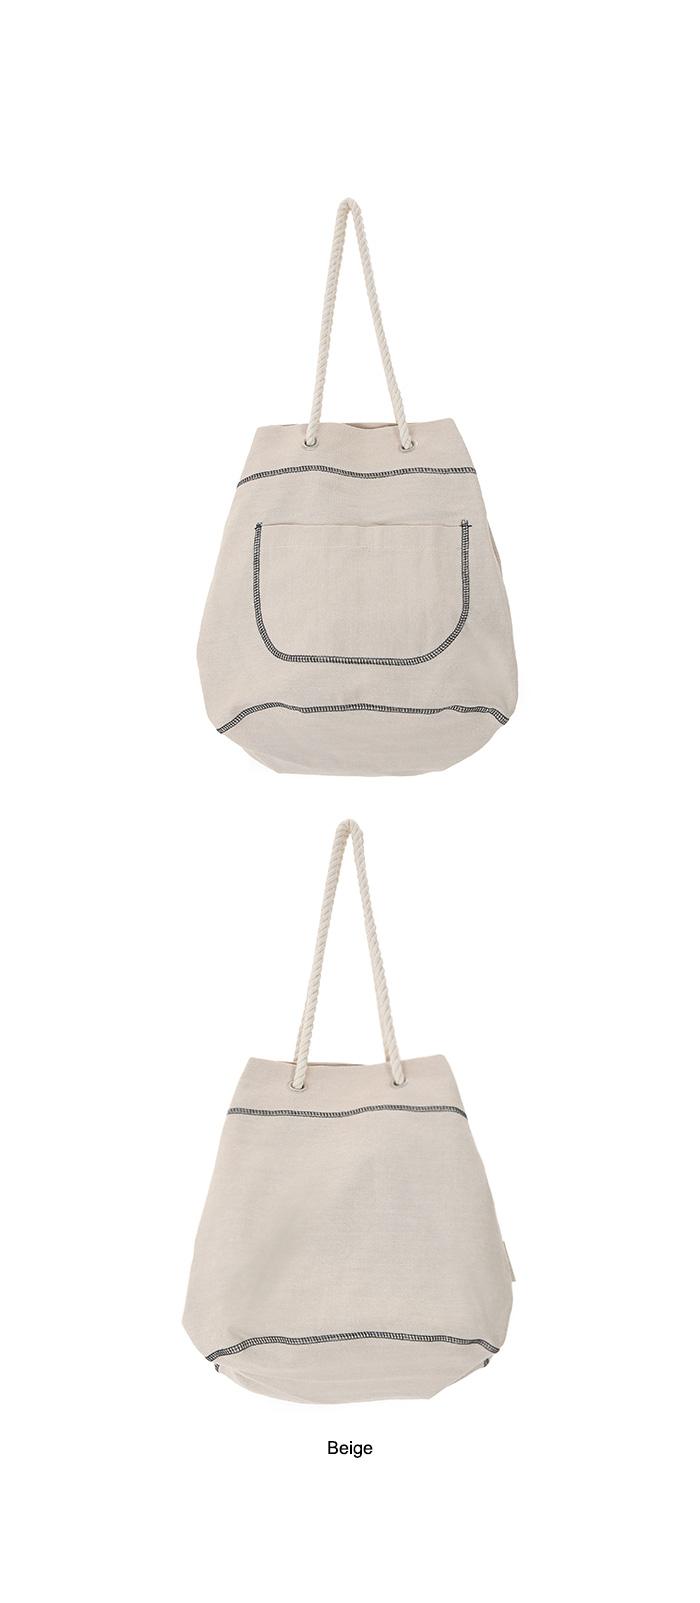 Lucy stitch bag